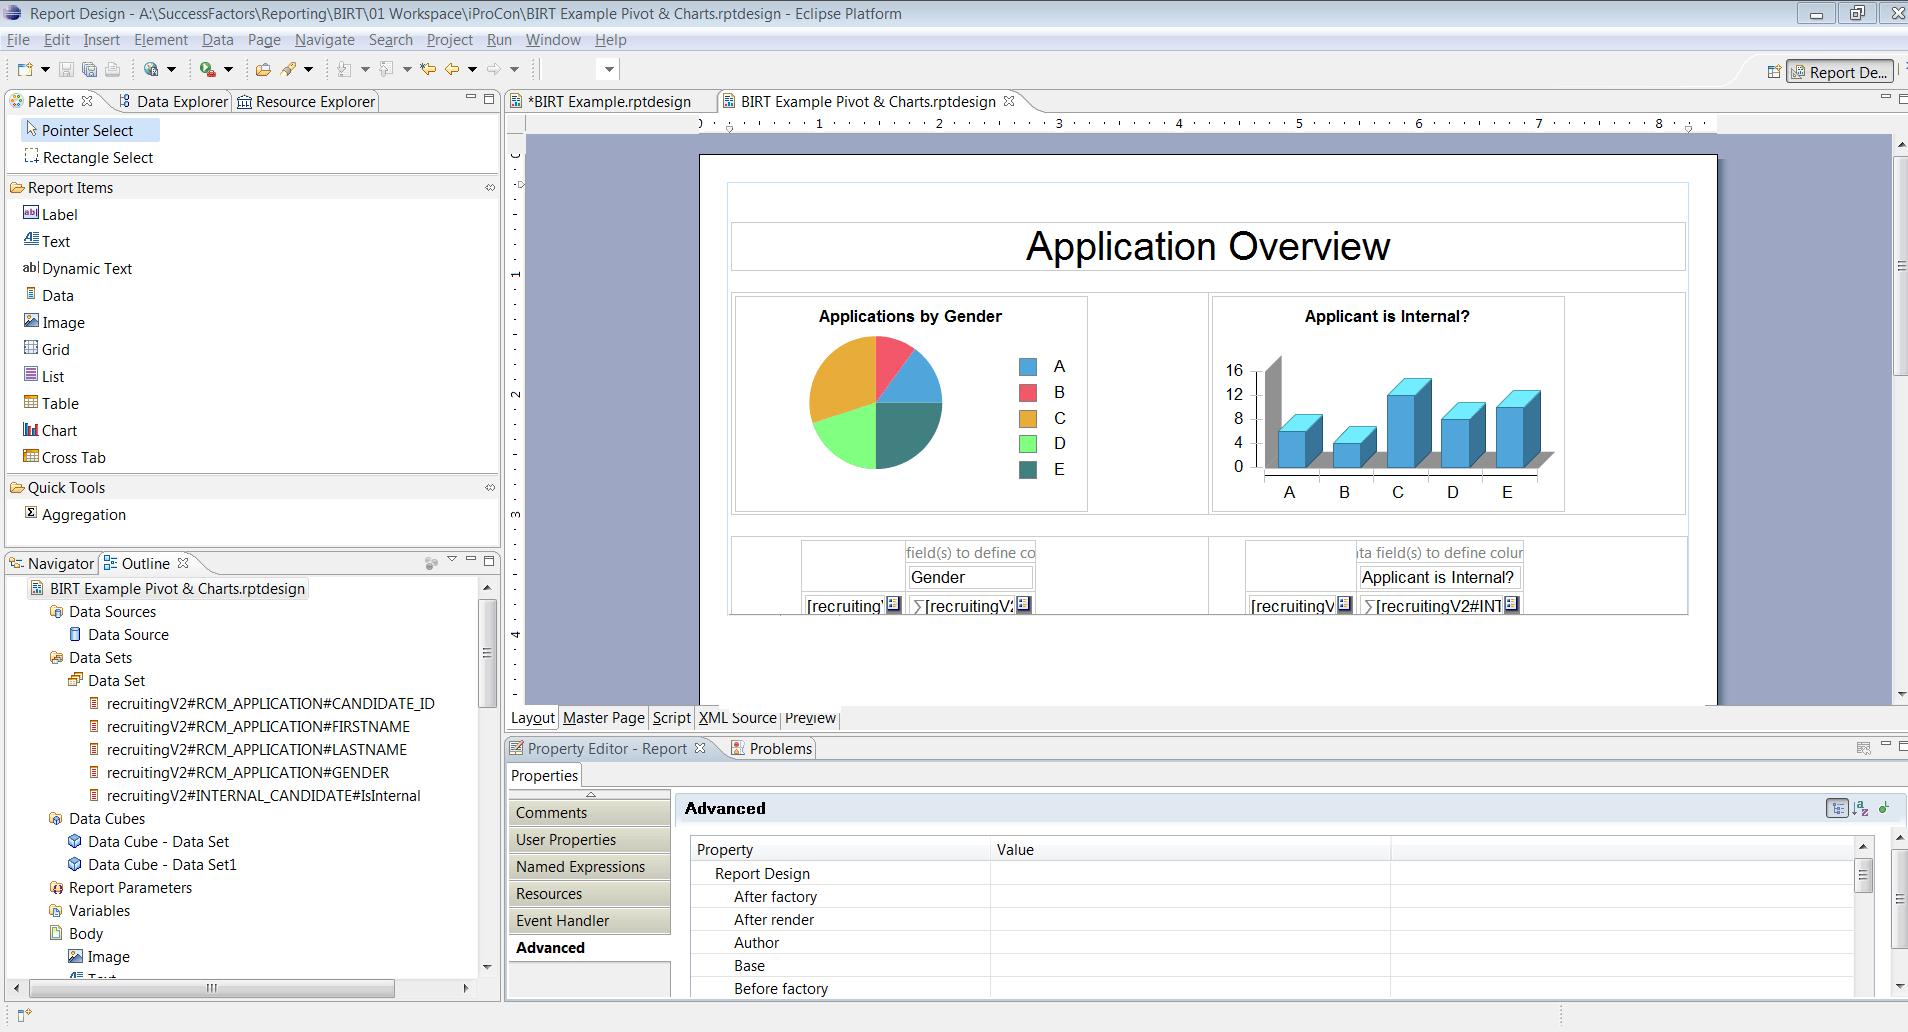 Birt Report Templates In Sap Successfactors – Part 3 - Ixerv Pertaining To Birt Report Templates